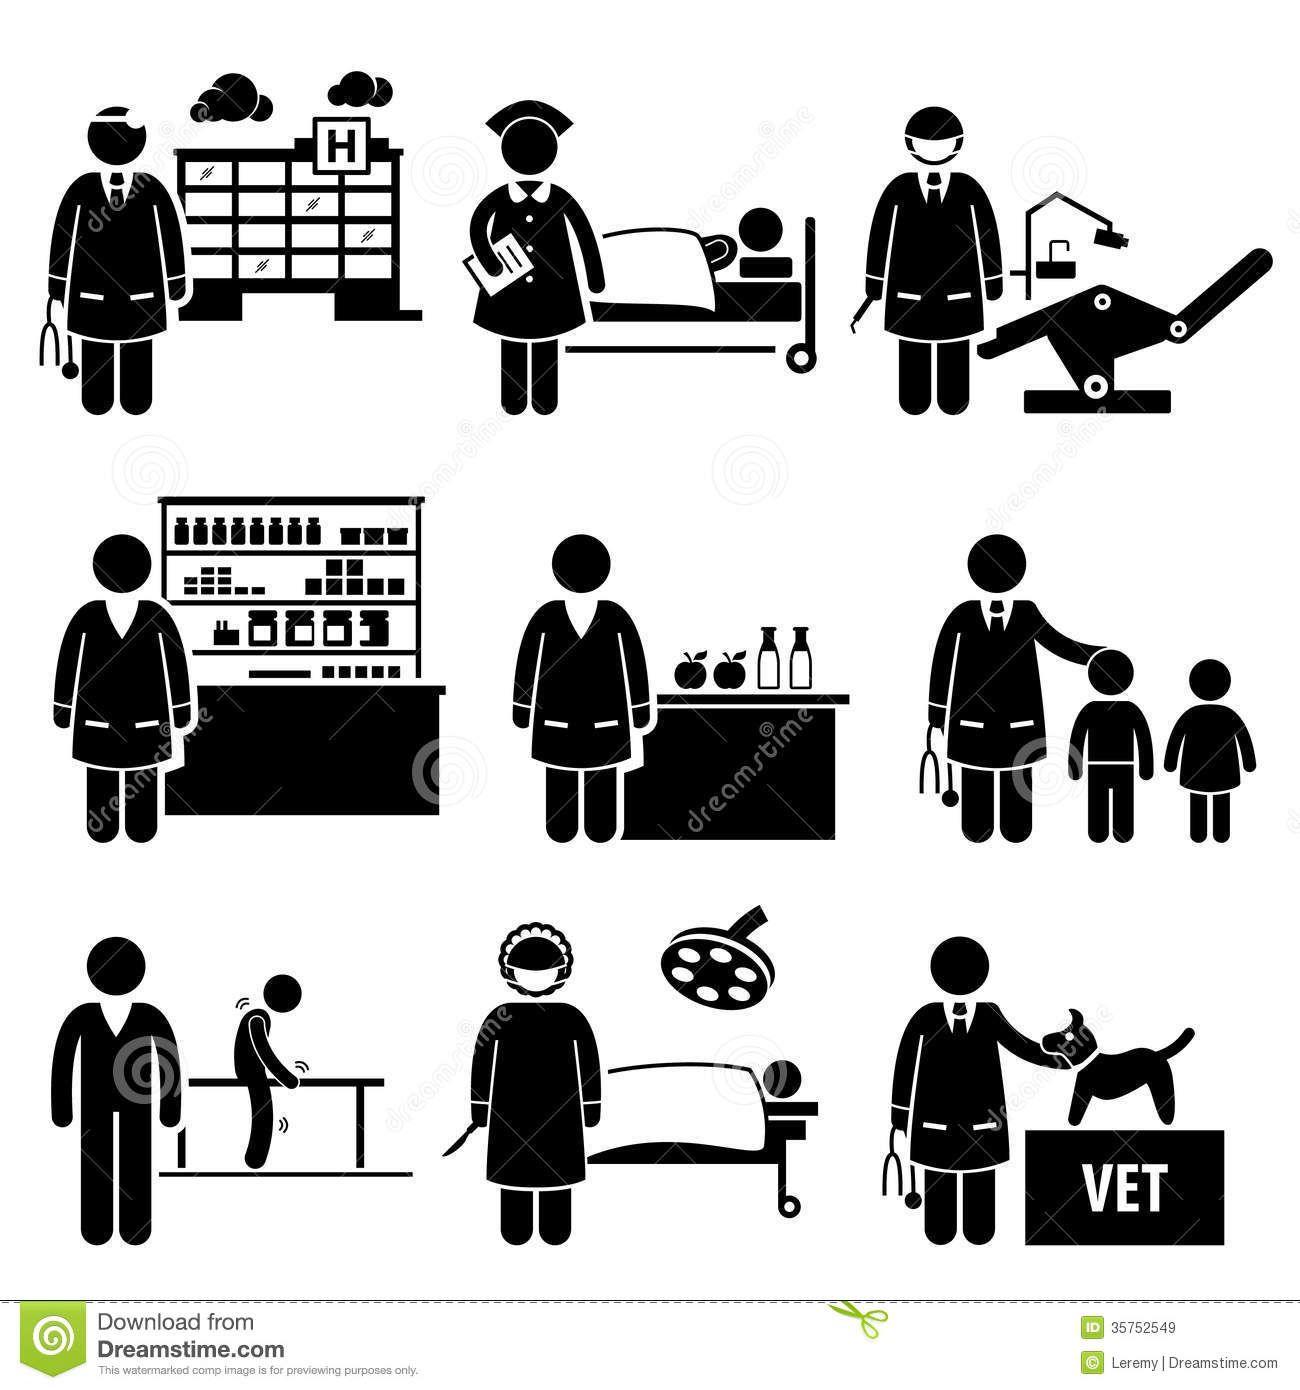 Medical Healthcare Hospital Jobs Occupations Caree